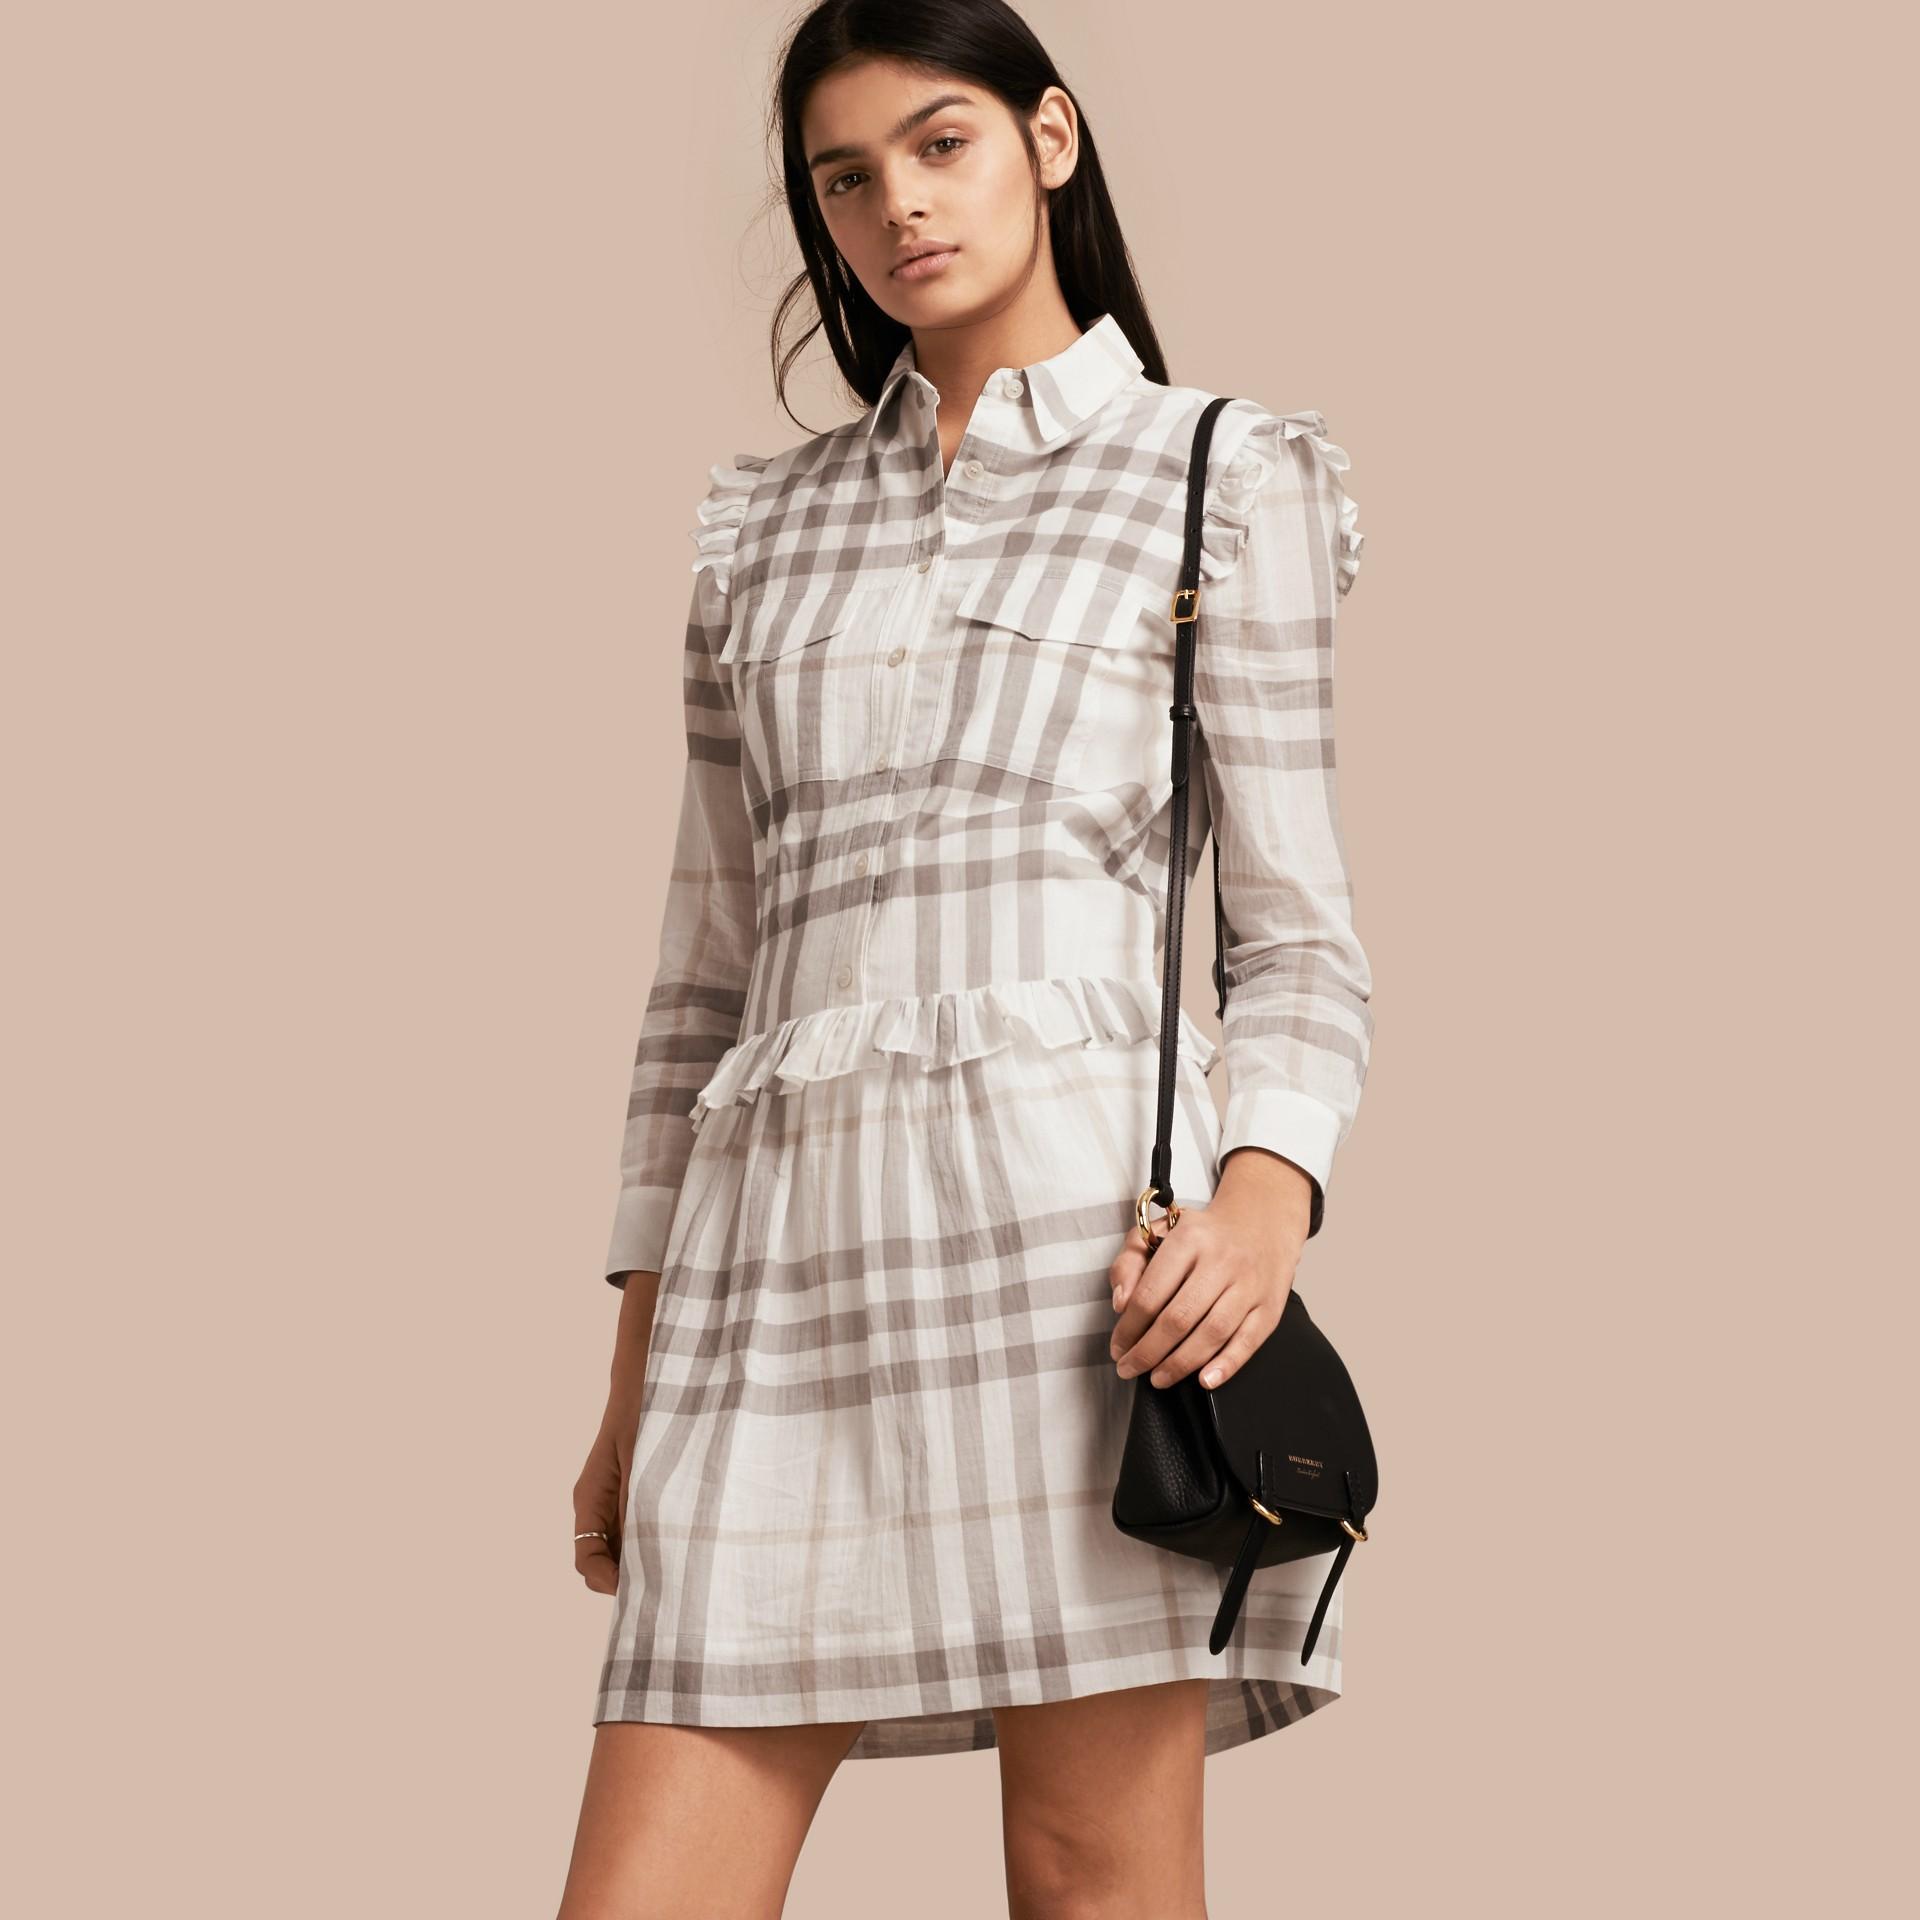 Ruffle Detail Cotton Check Shirt Dress Natural White - gallery image 1